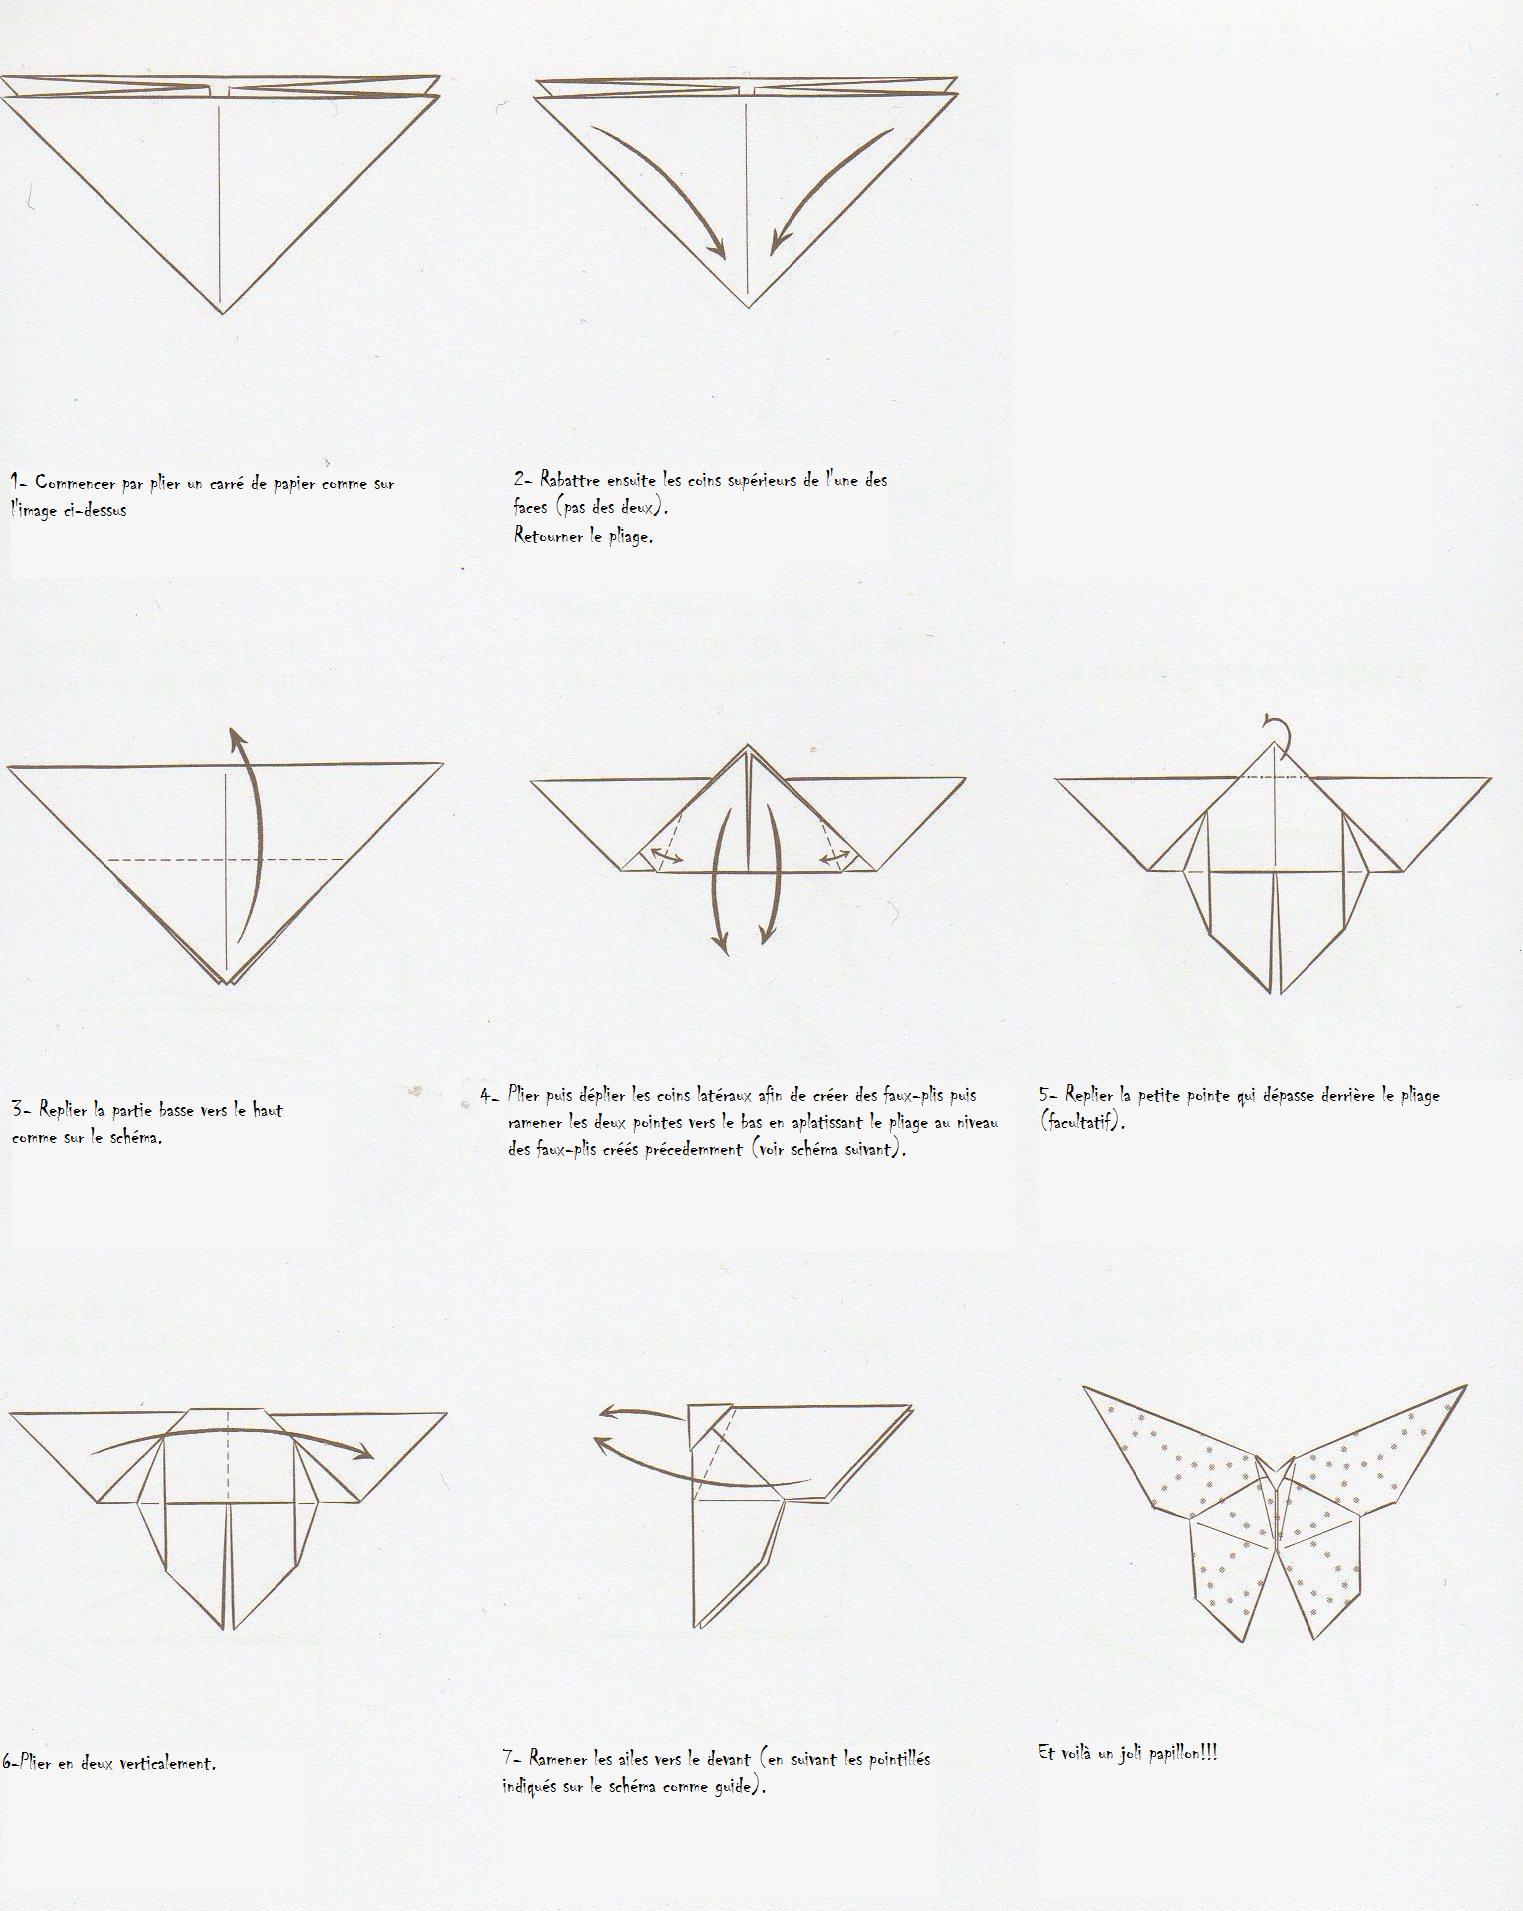 pin tuto papillon origami le blog de karinethiboultover blogcom on pinterest. Black Bedroom Furniture Sets. Home Design Ideas